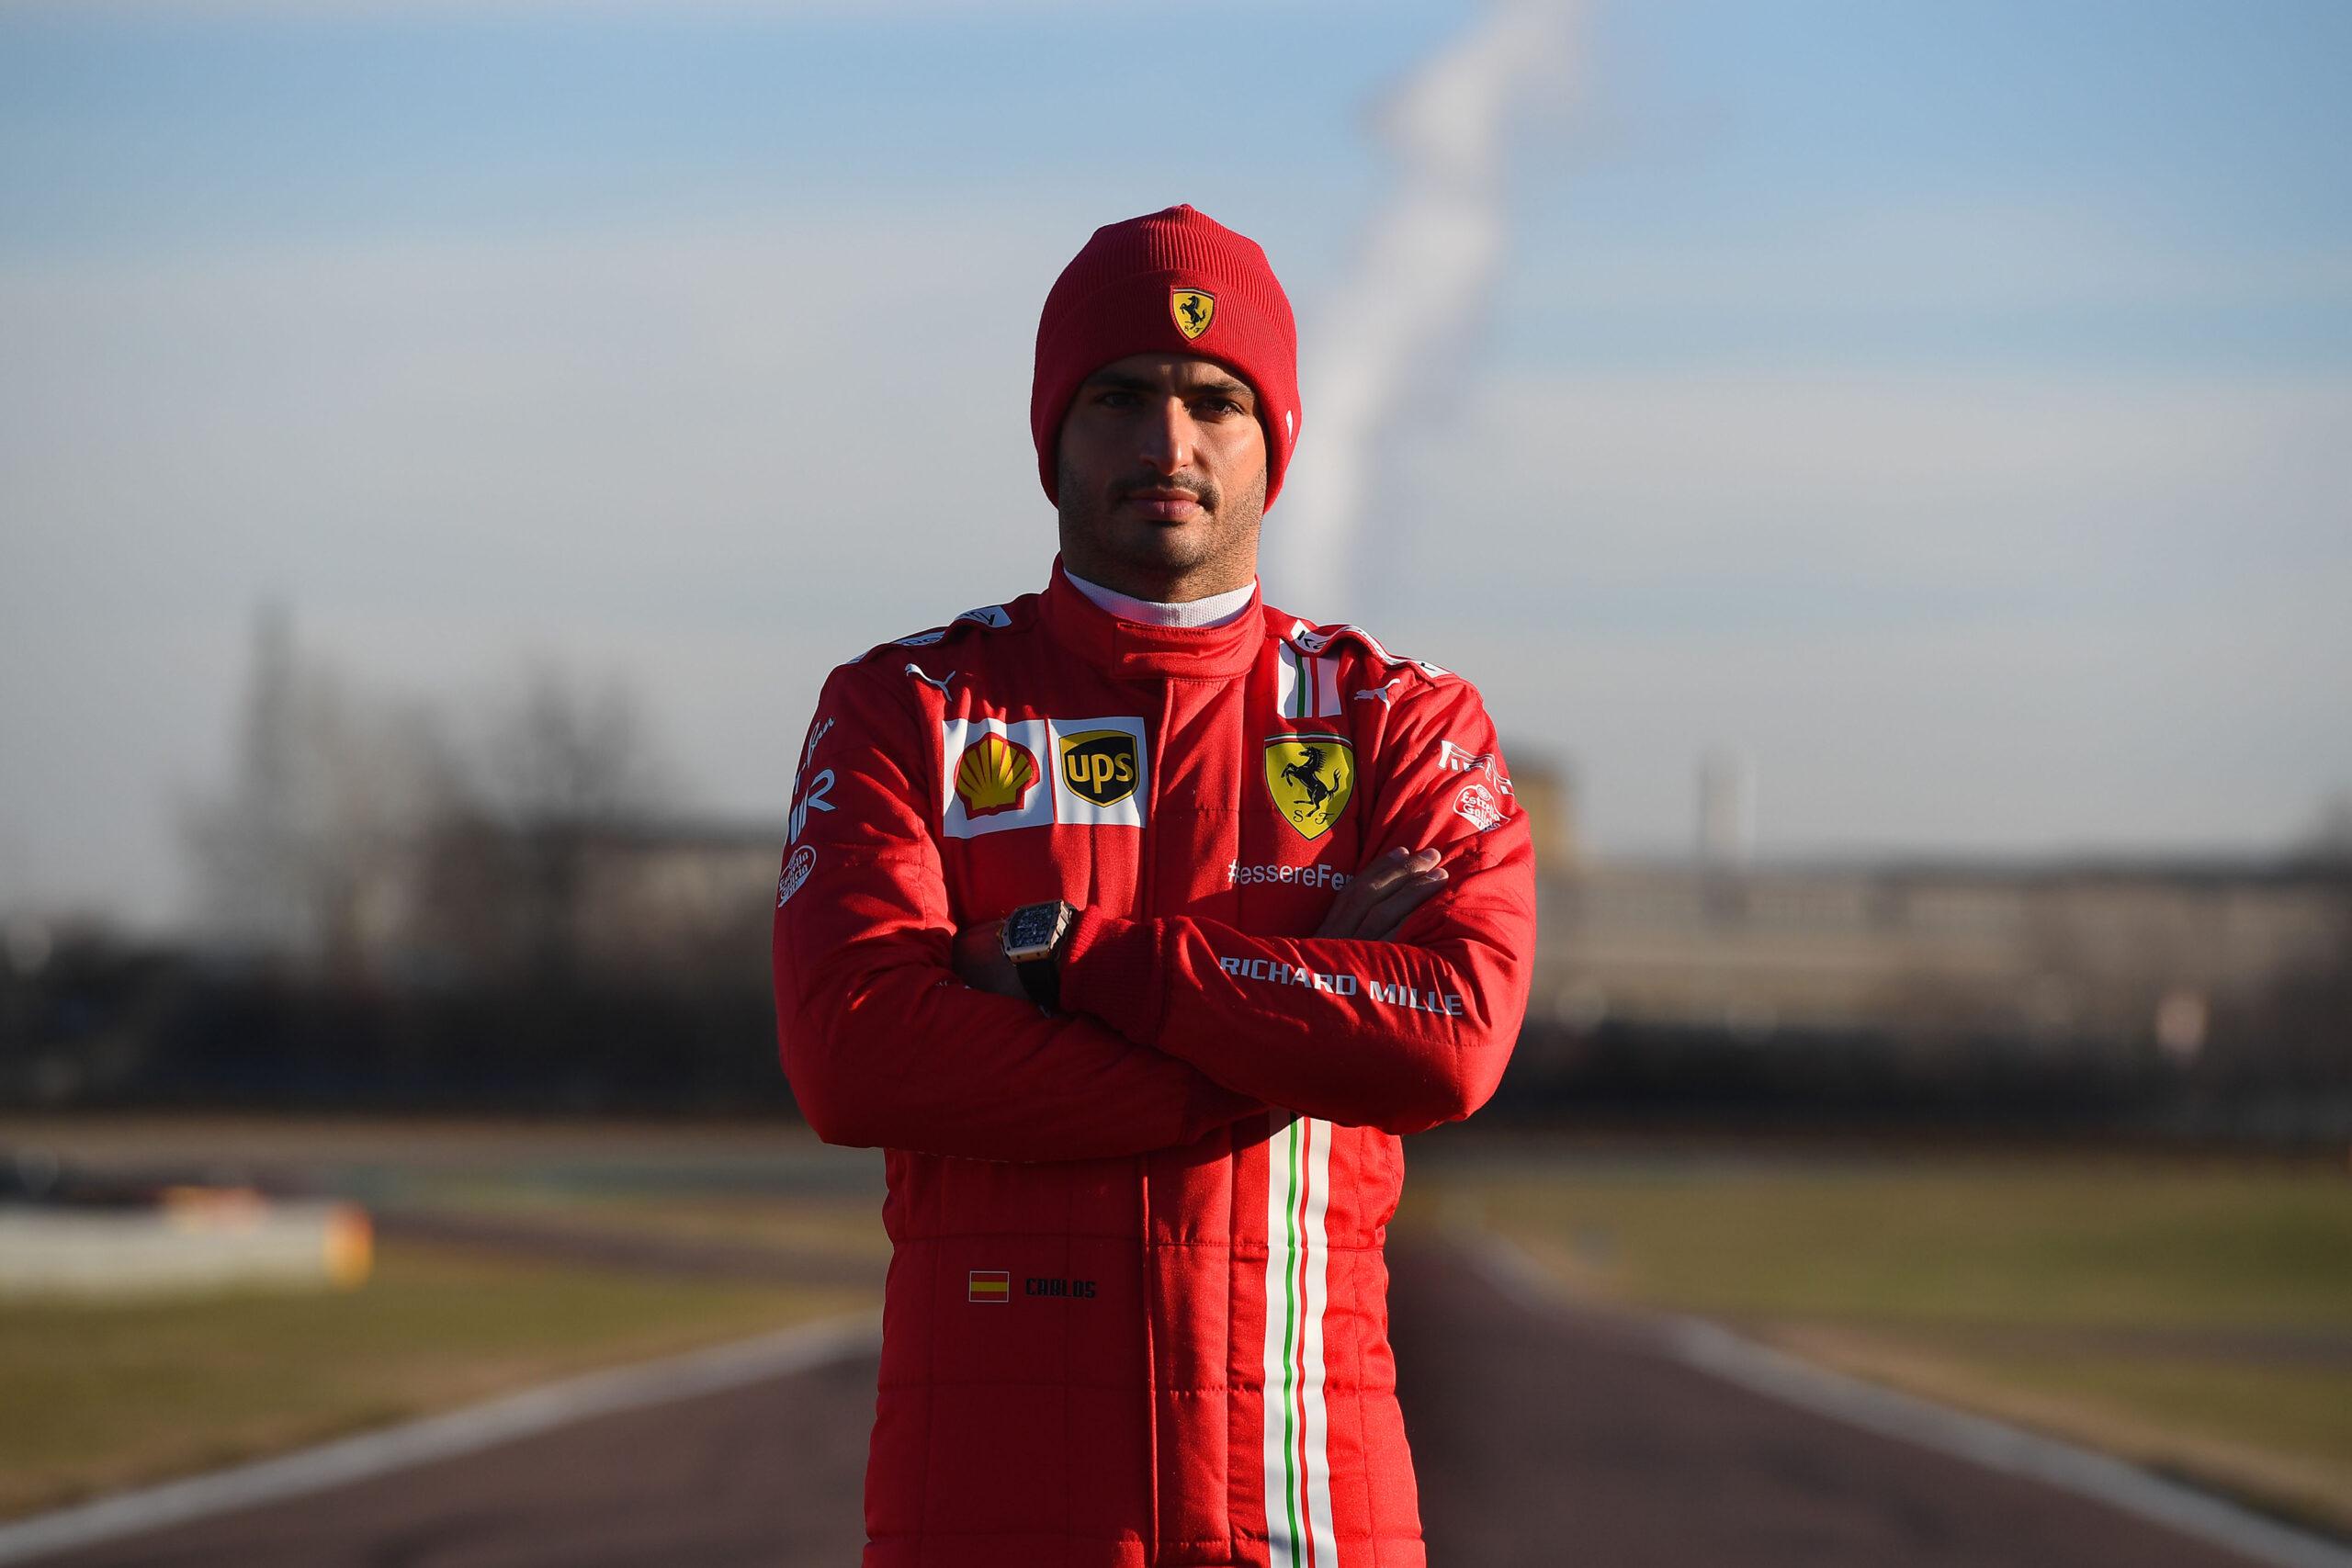 F1 - Estrella Galicia et Richard Mille rejoignent la Scuderia Ferrari